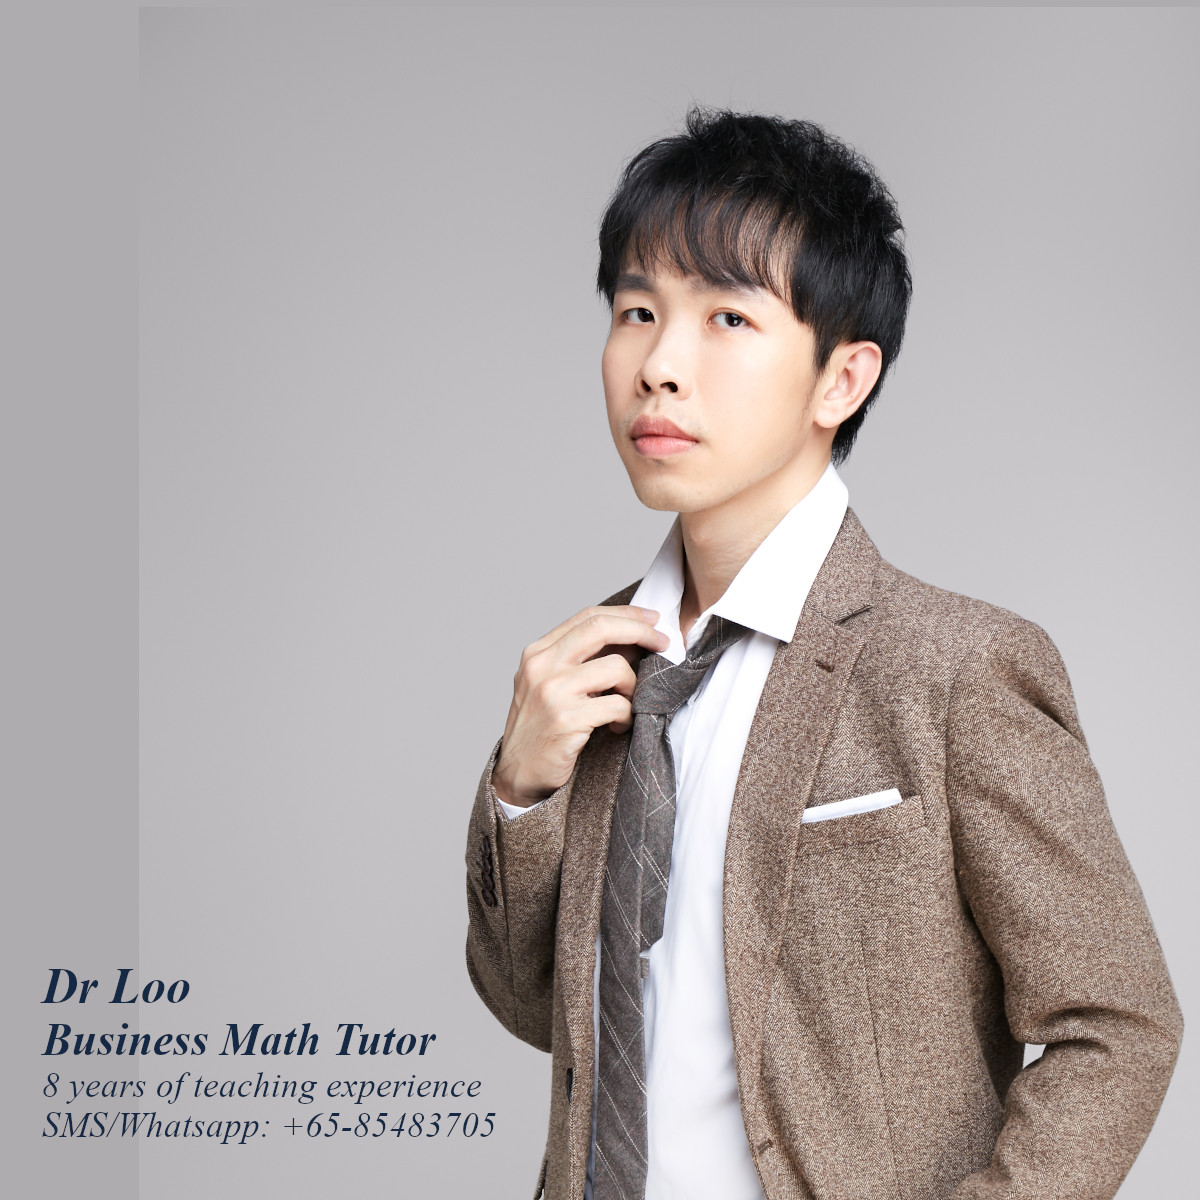 Business Mathematics Tutor in Singapore